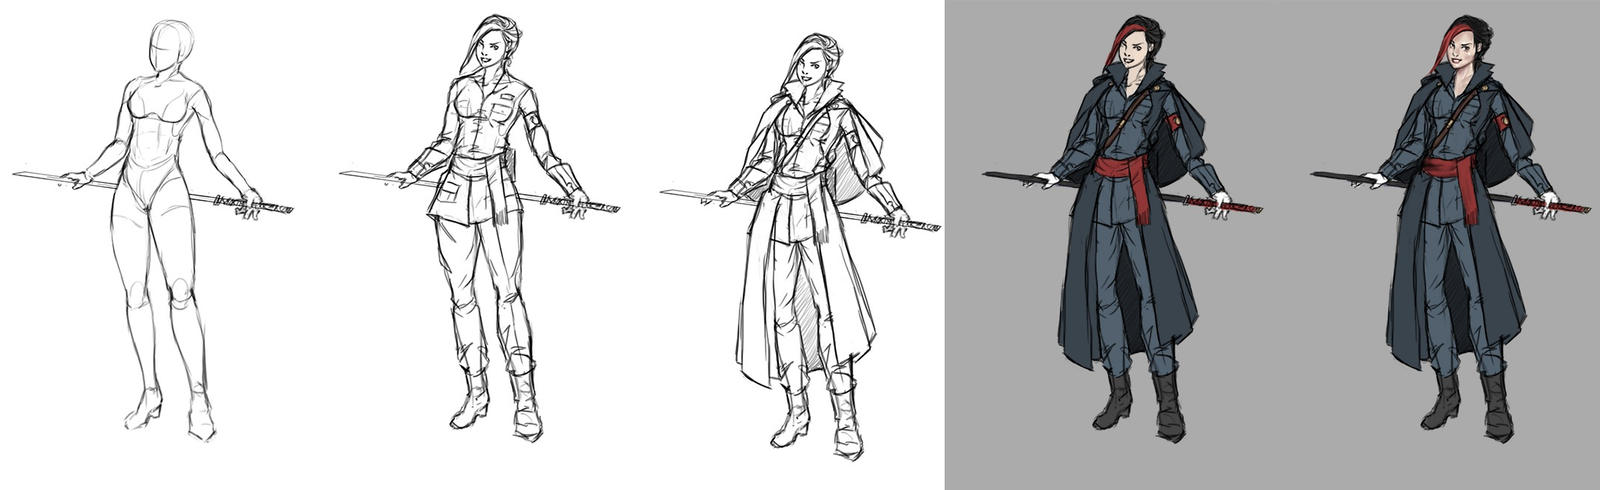 Character Development Design Process : Character design process val by eduardogaray on deviantart